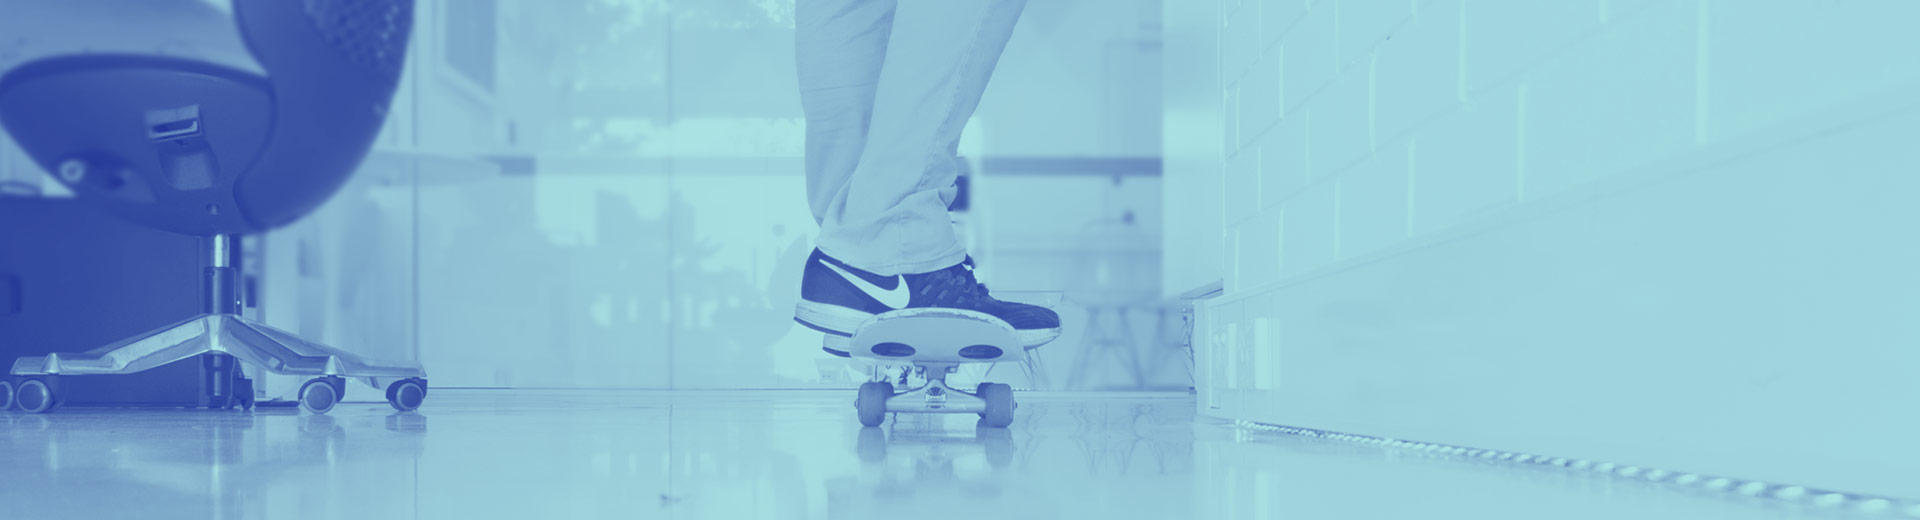 Skateboard in Cronulla Web Designs Office